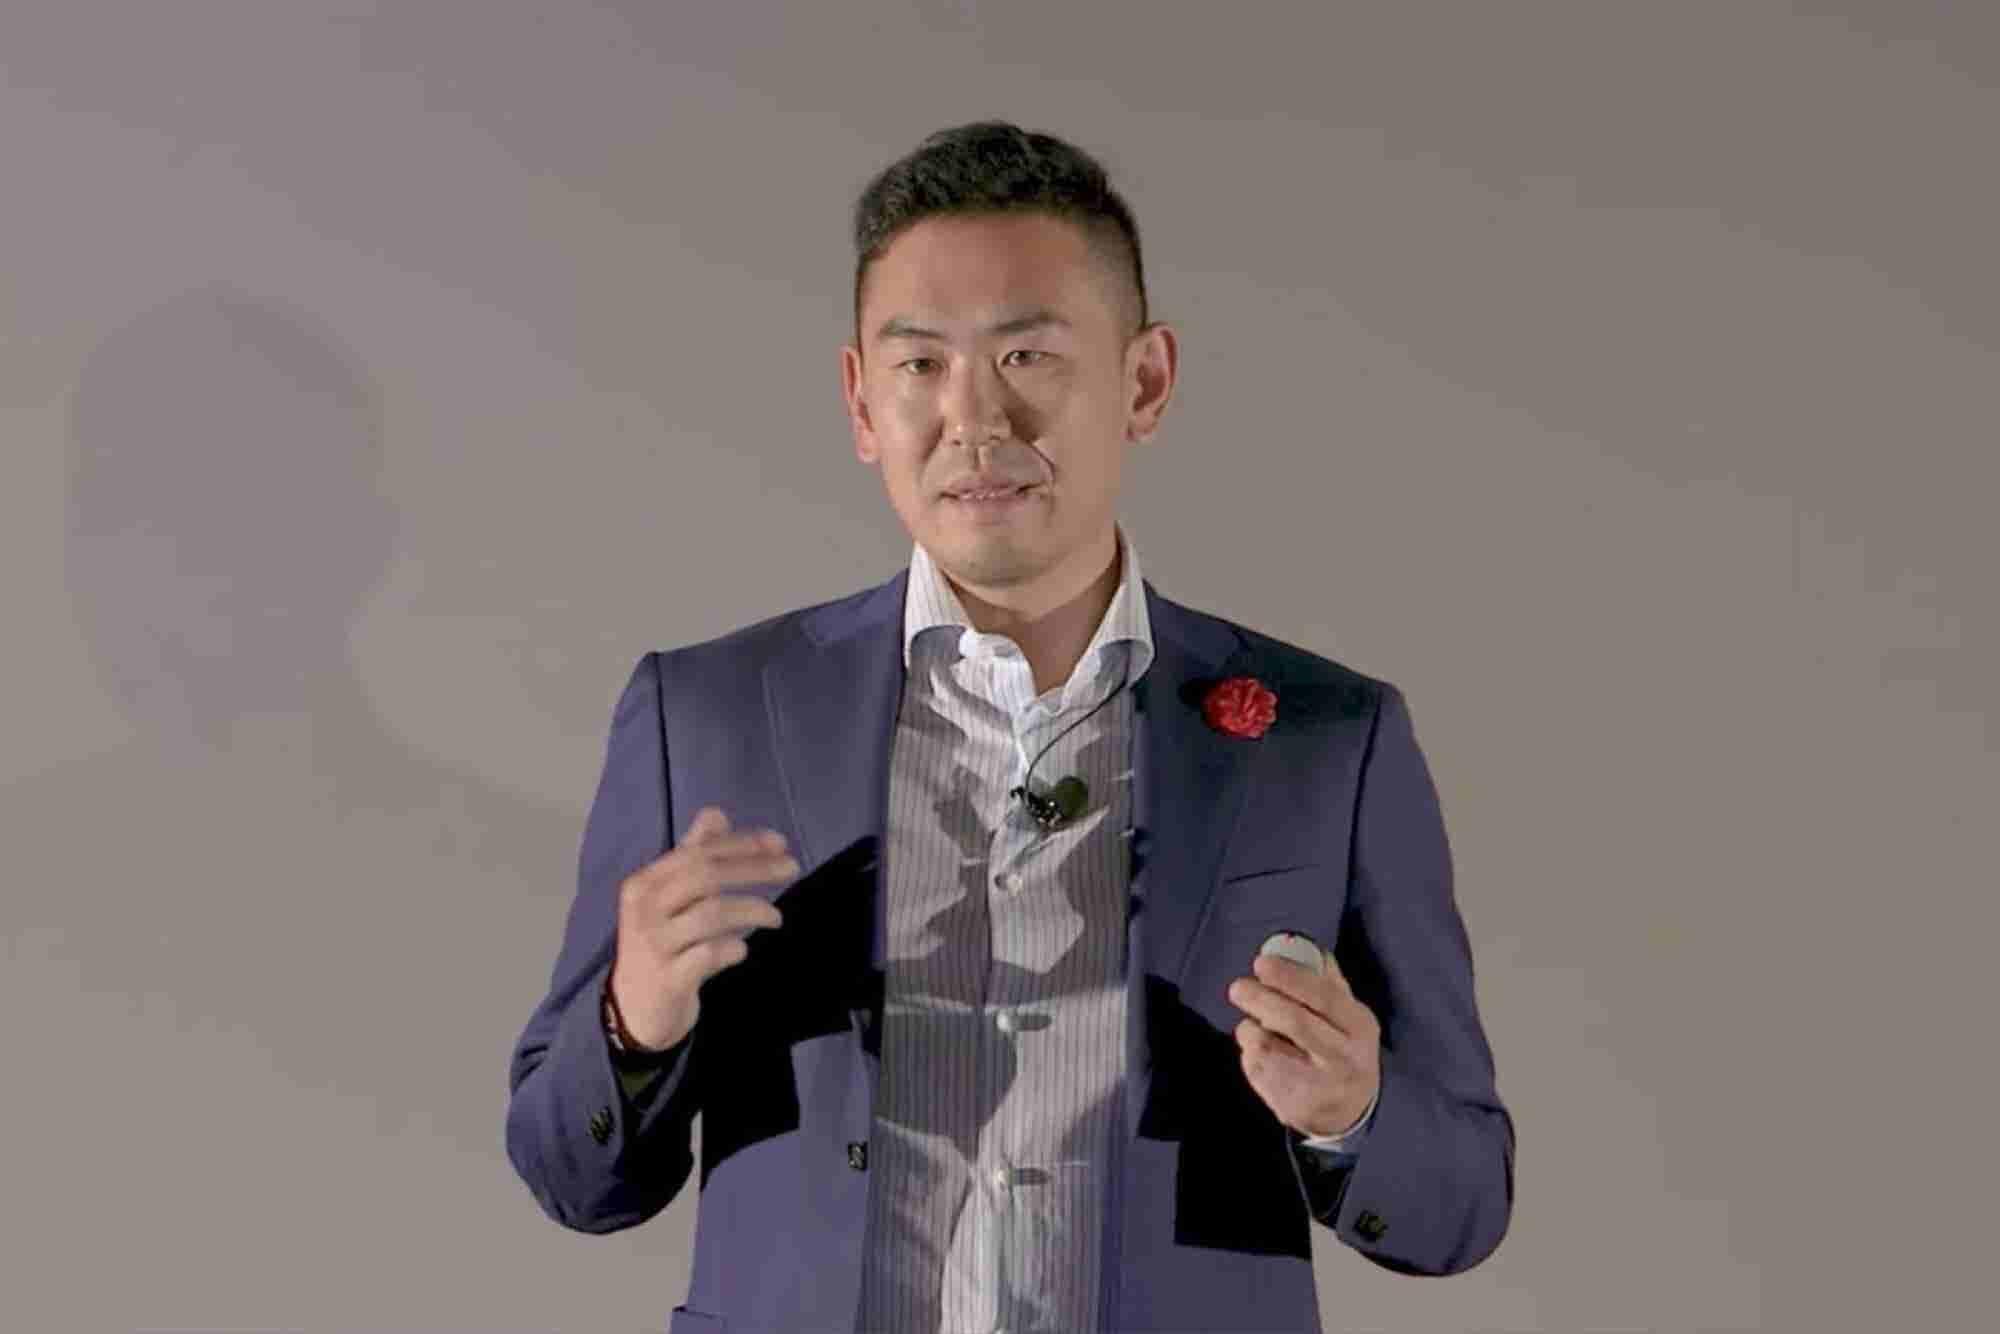 3 TED Talk Lessons Aspiring Entrepreneurs Should Watch